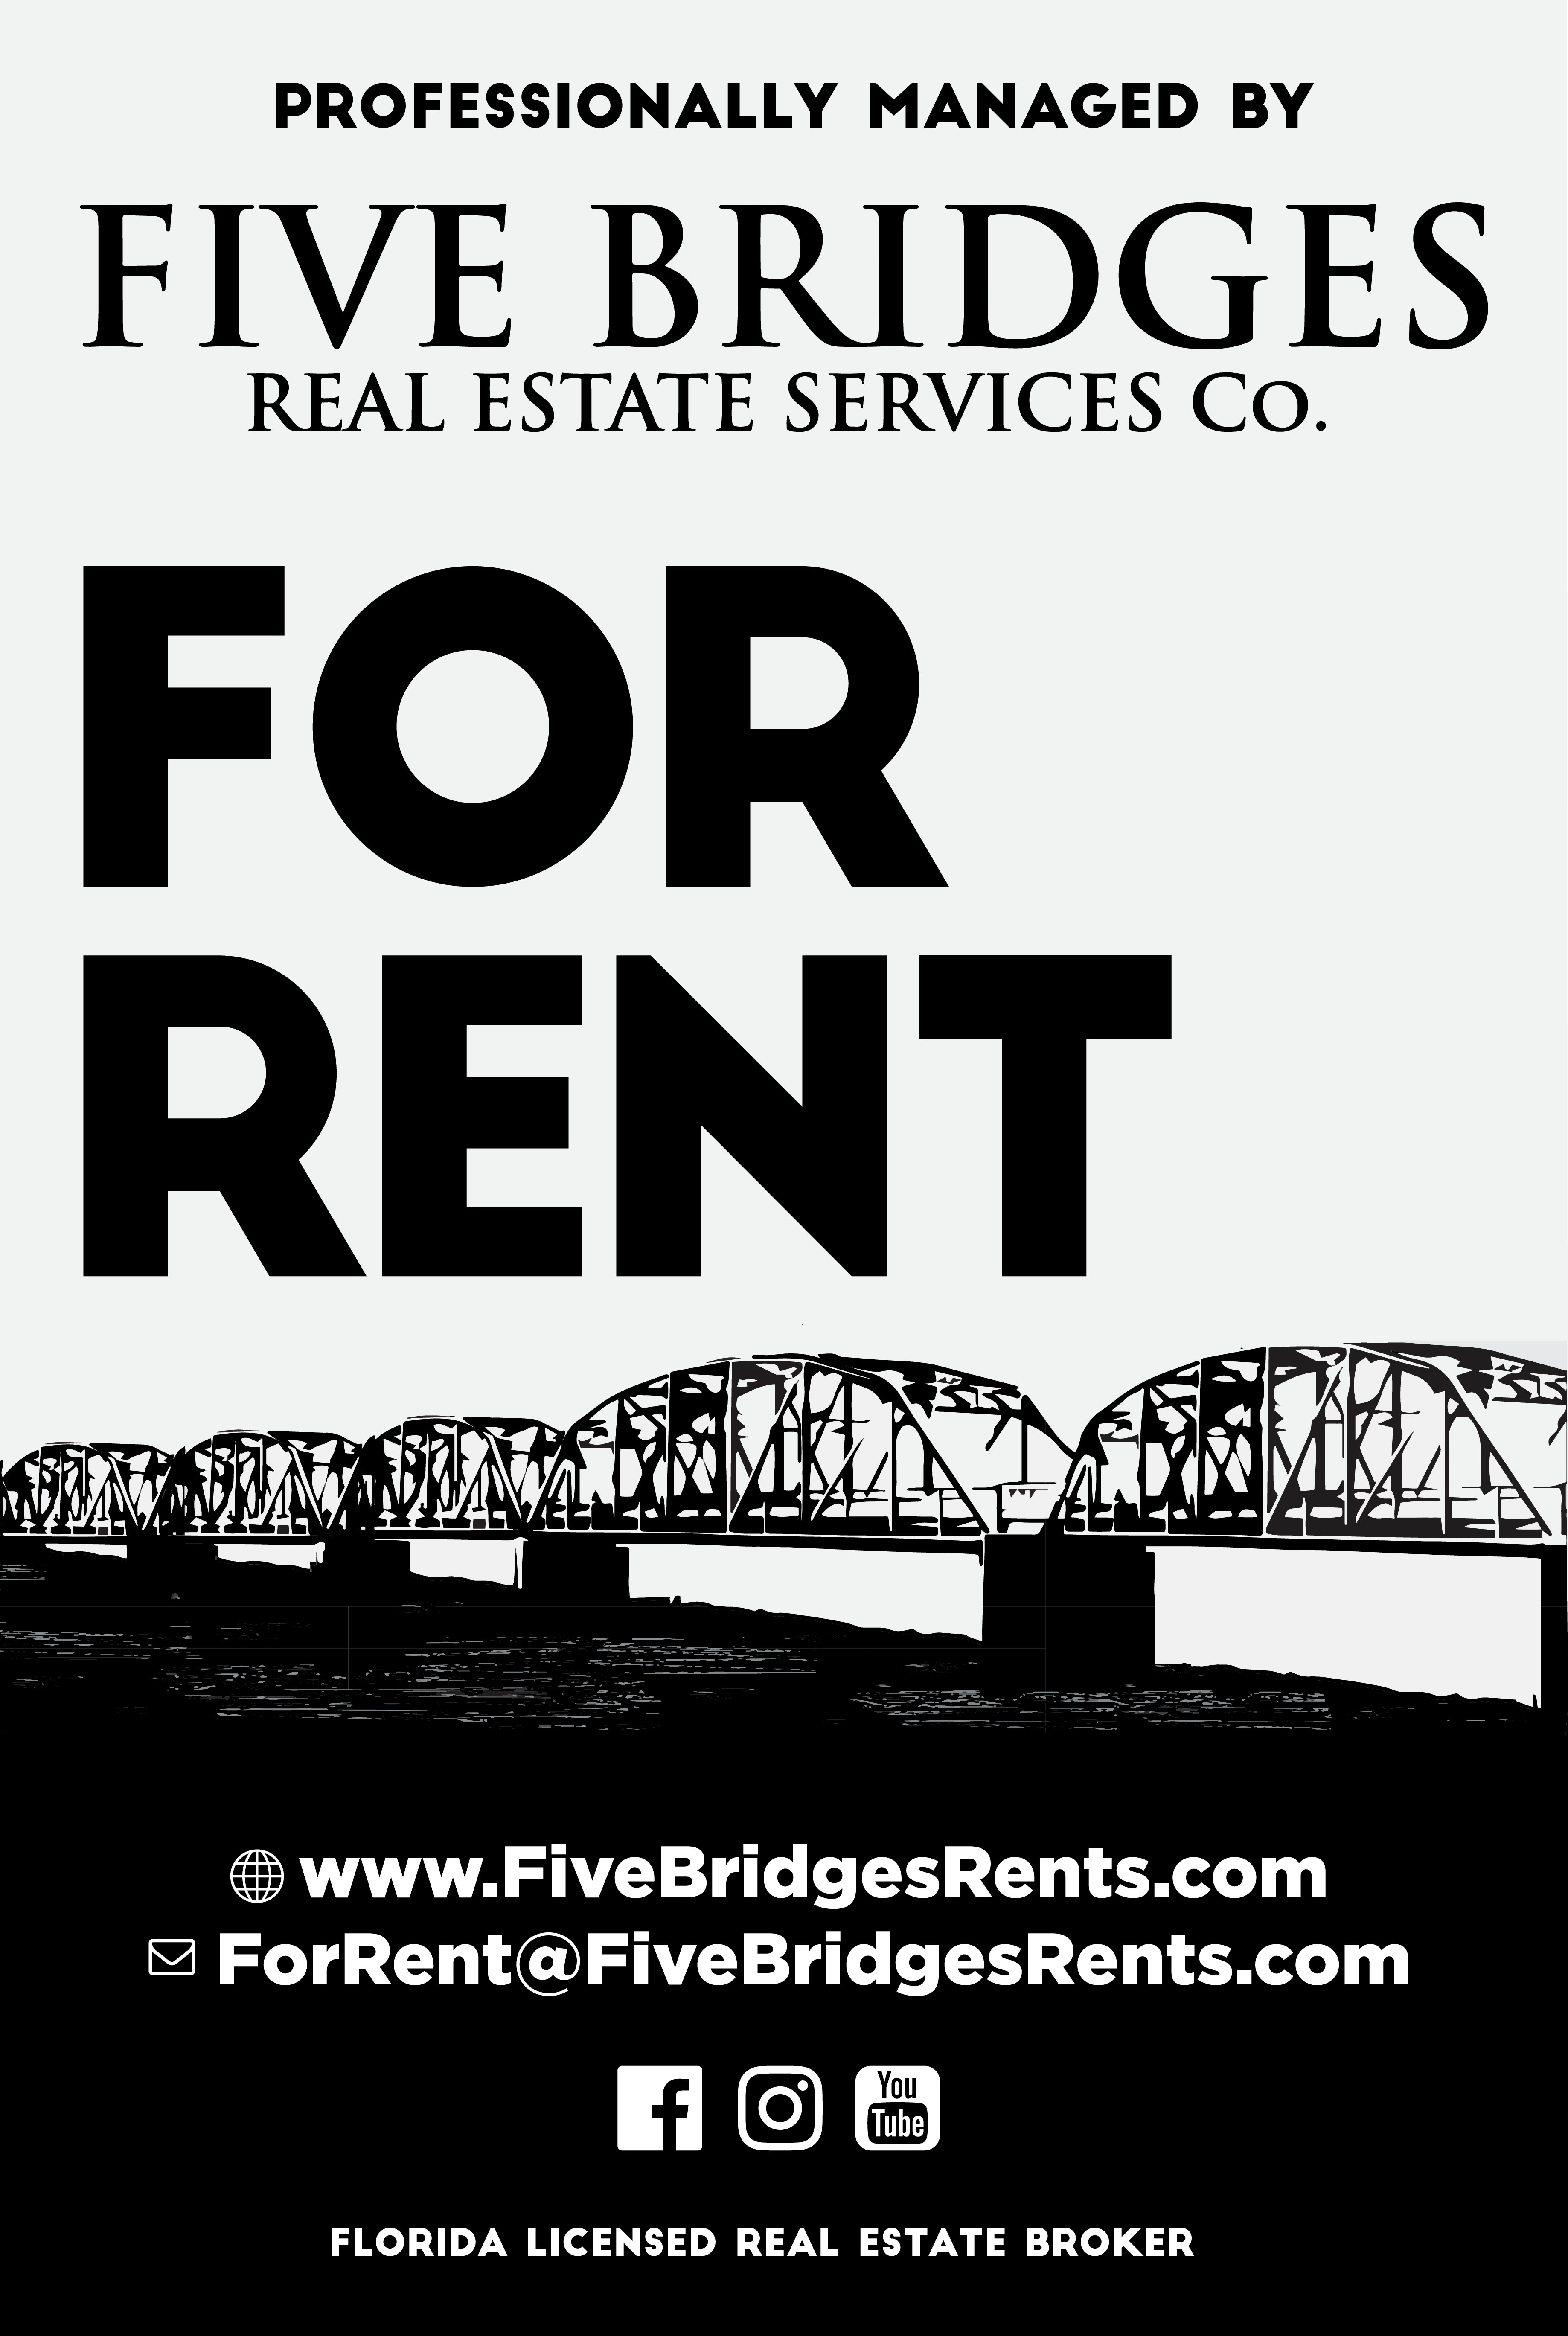 Design A Memorable Real Estate Sign | Five Bridges Real Estate Services